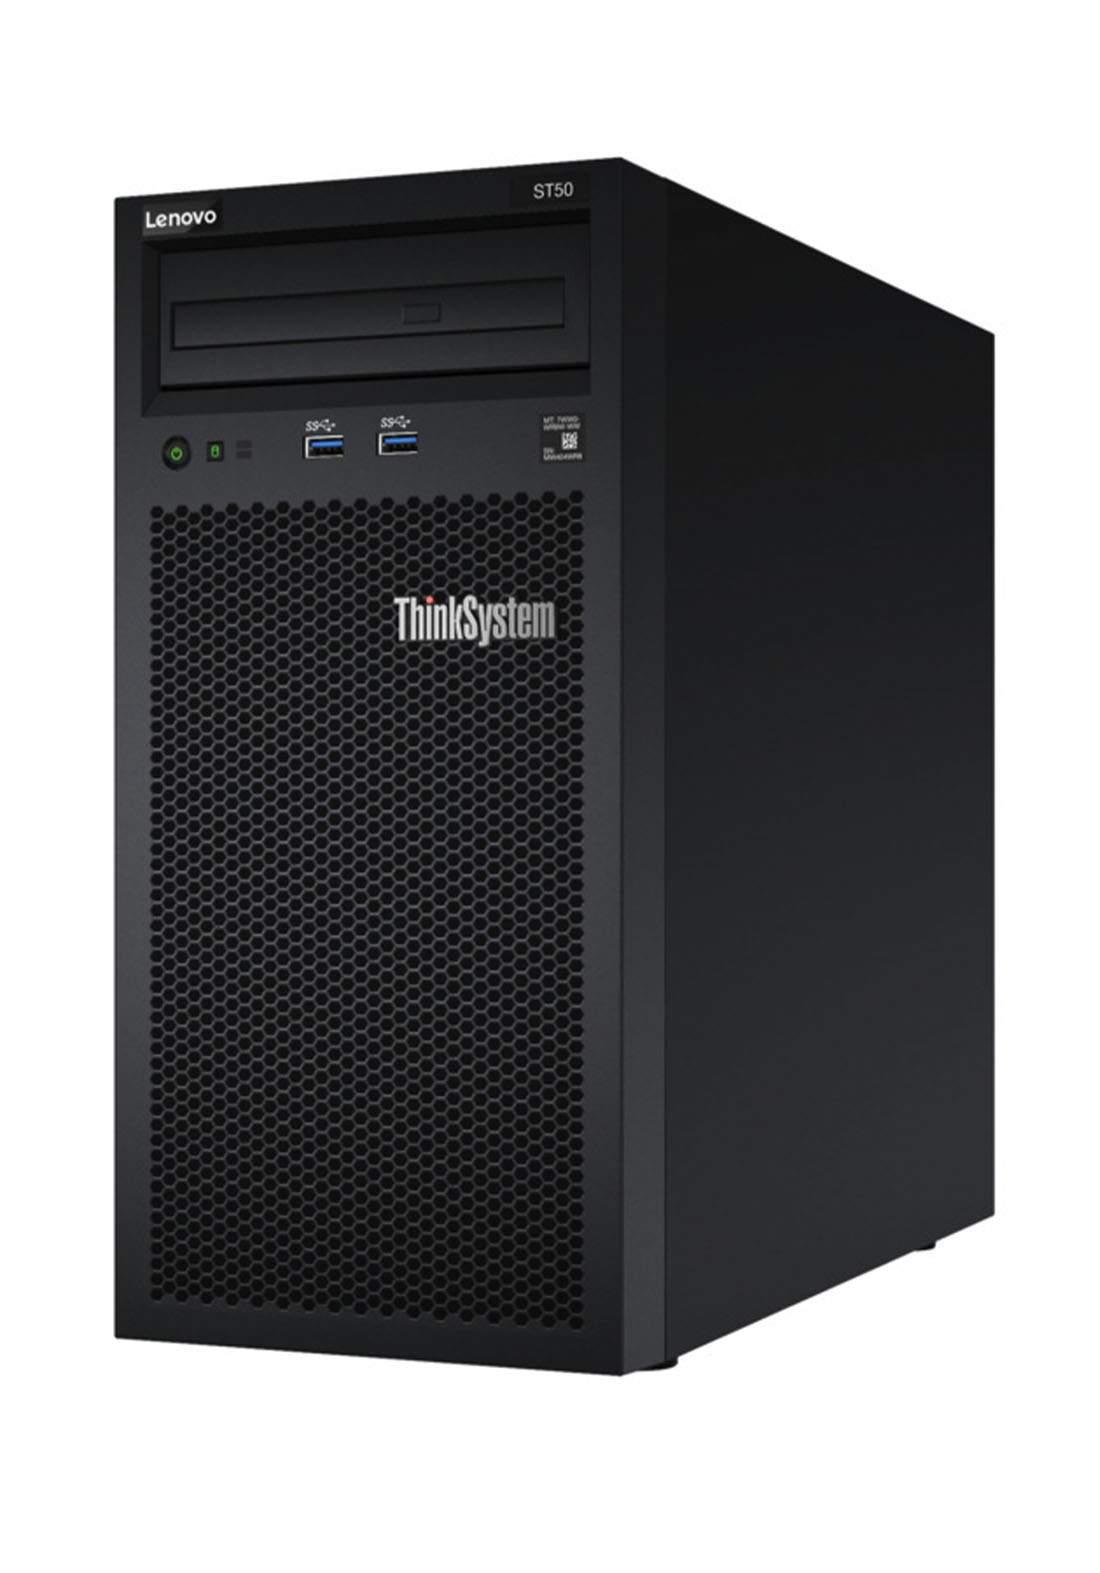 Lenovo Think System ST50 Server (7Y48A02DEA) - Black  كيس حاسبة